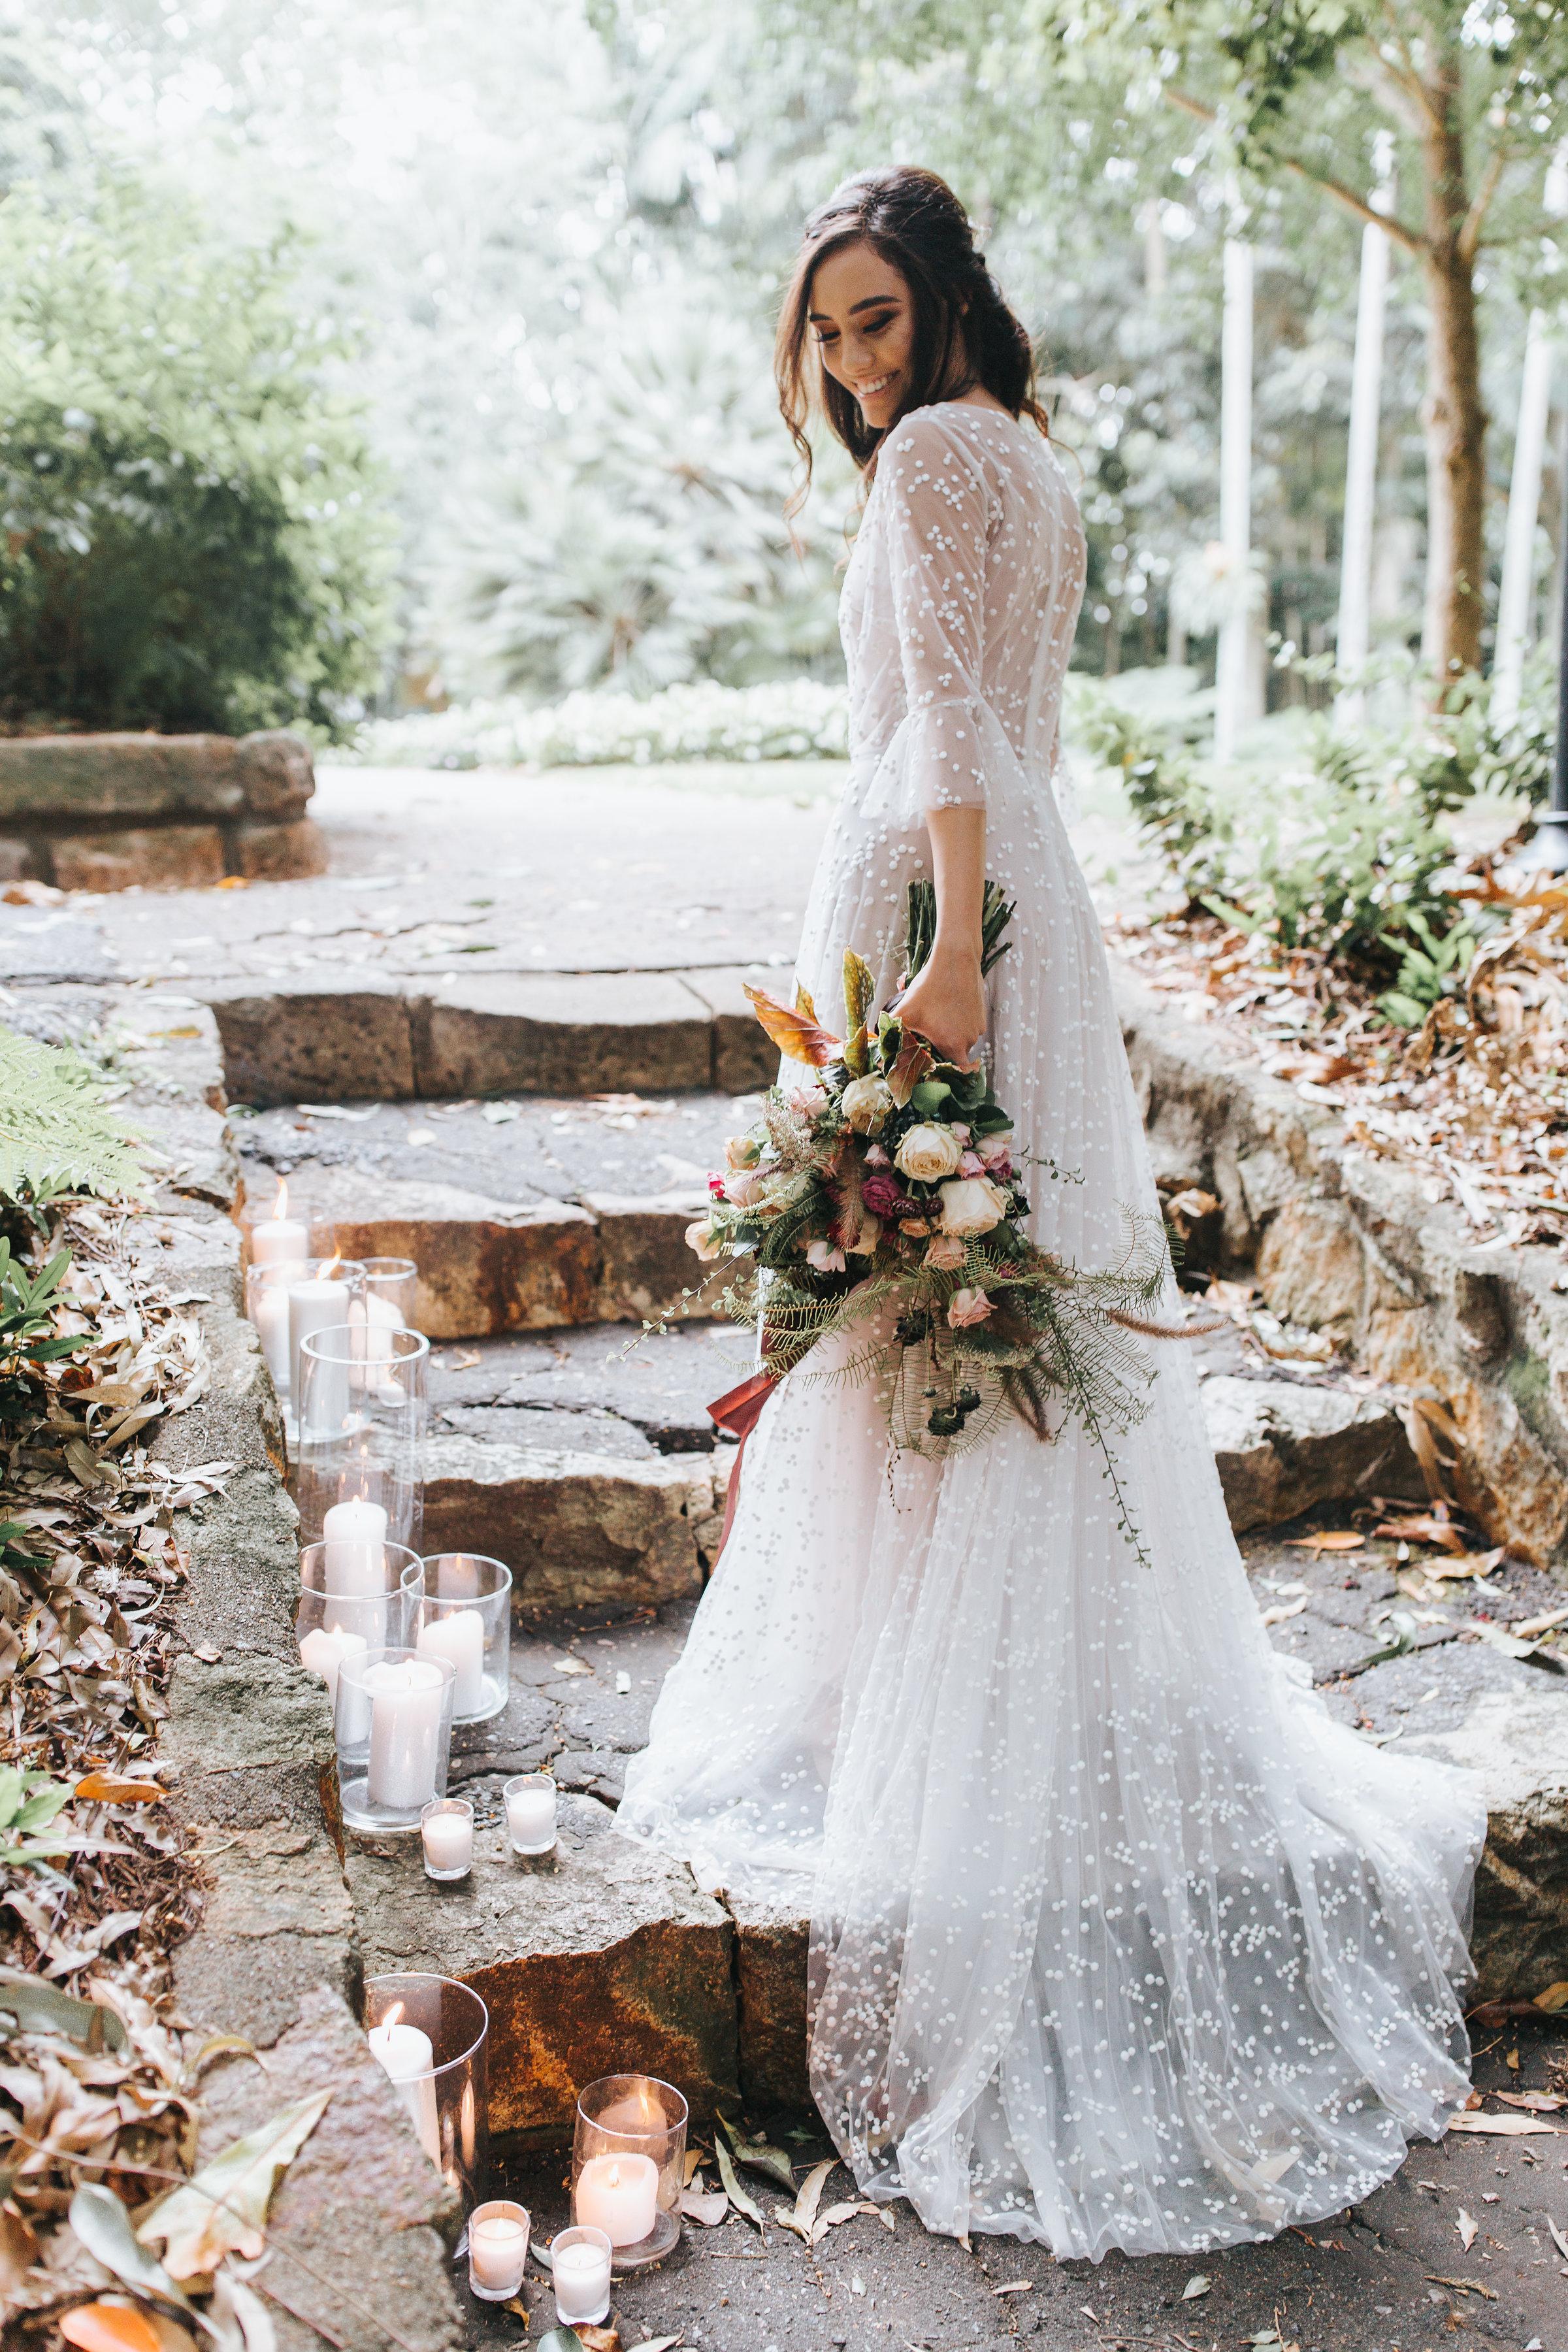 WeddingPlaybook_HighRes_MSP(289of417).jpg